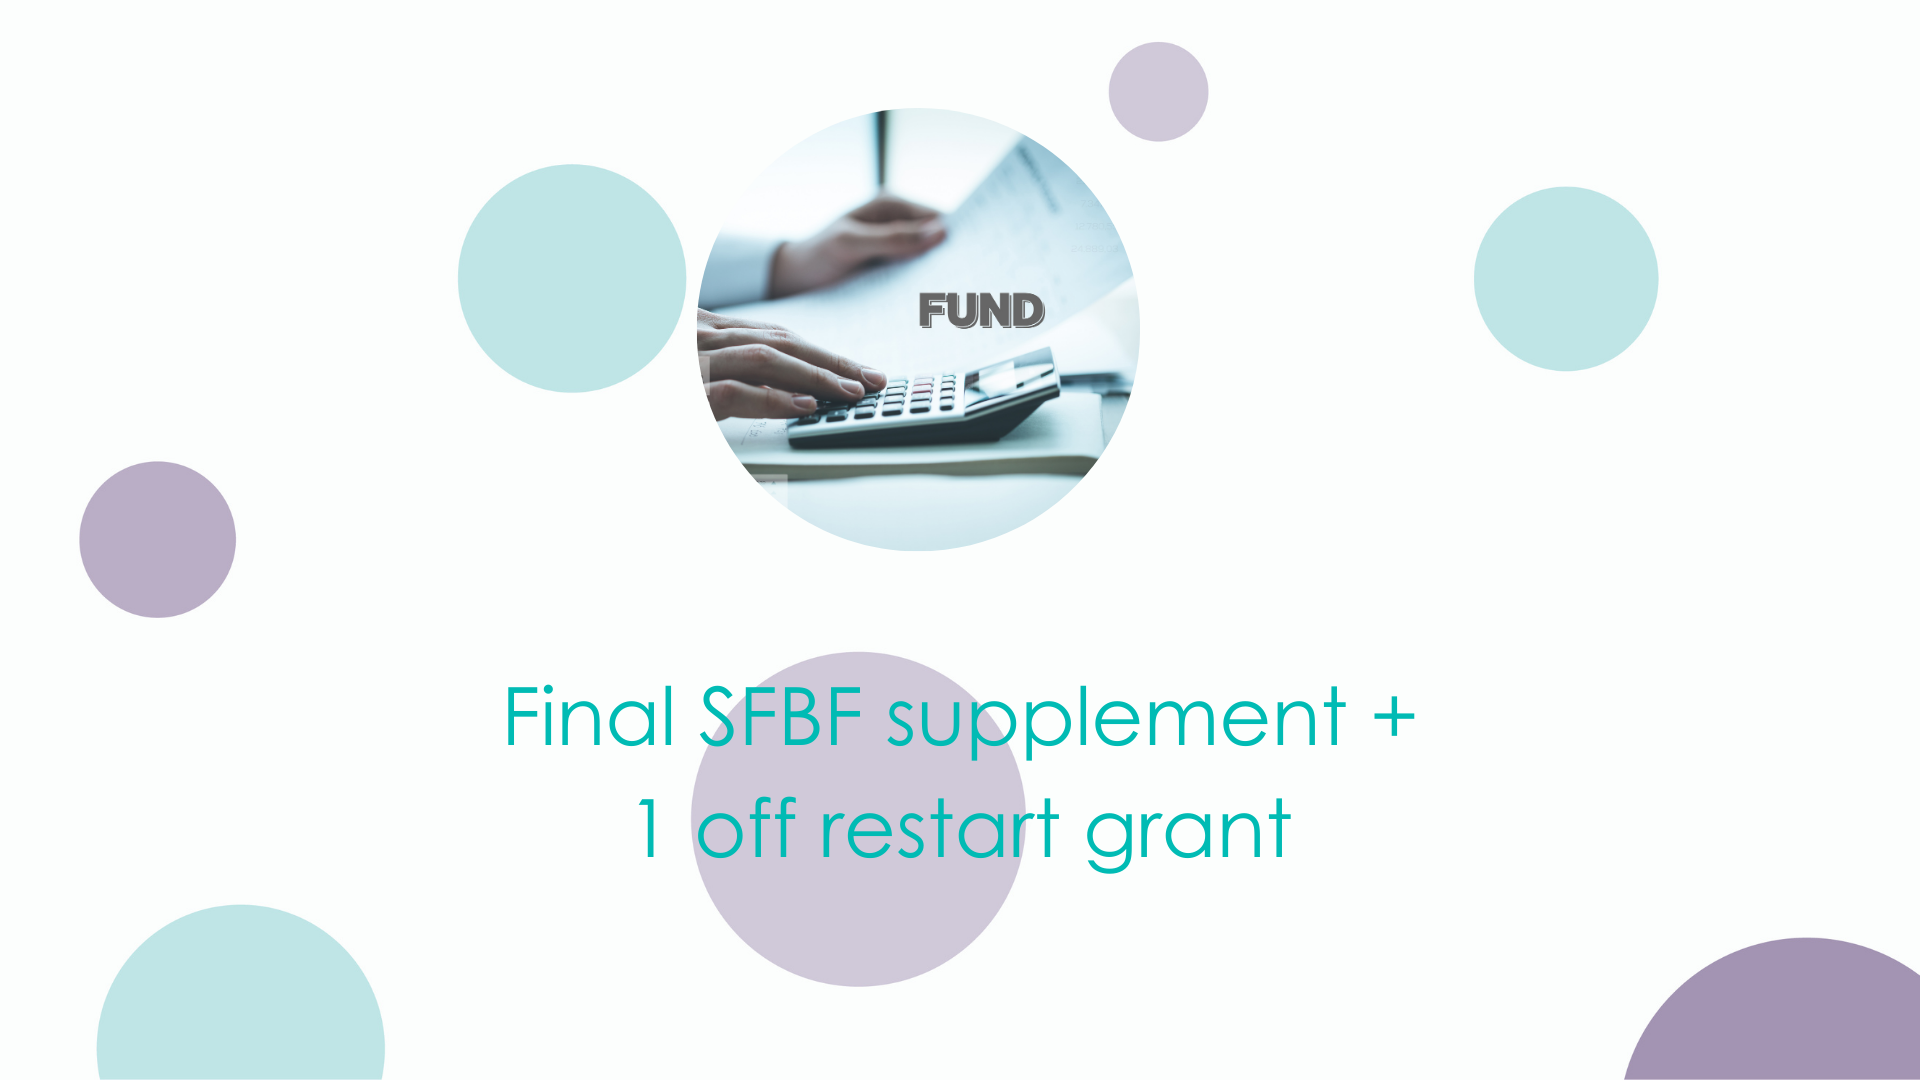 Final SFBF supplement and 1 off restart grant